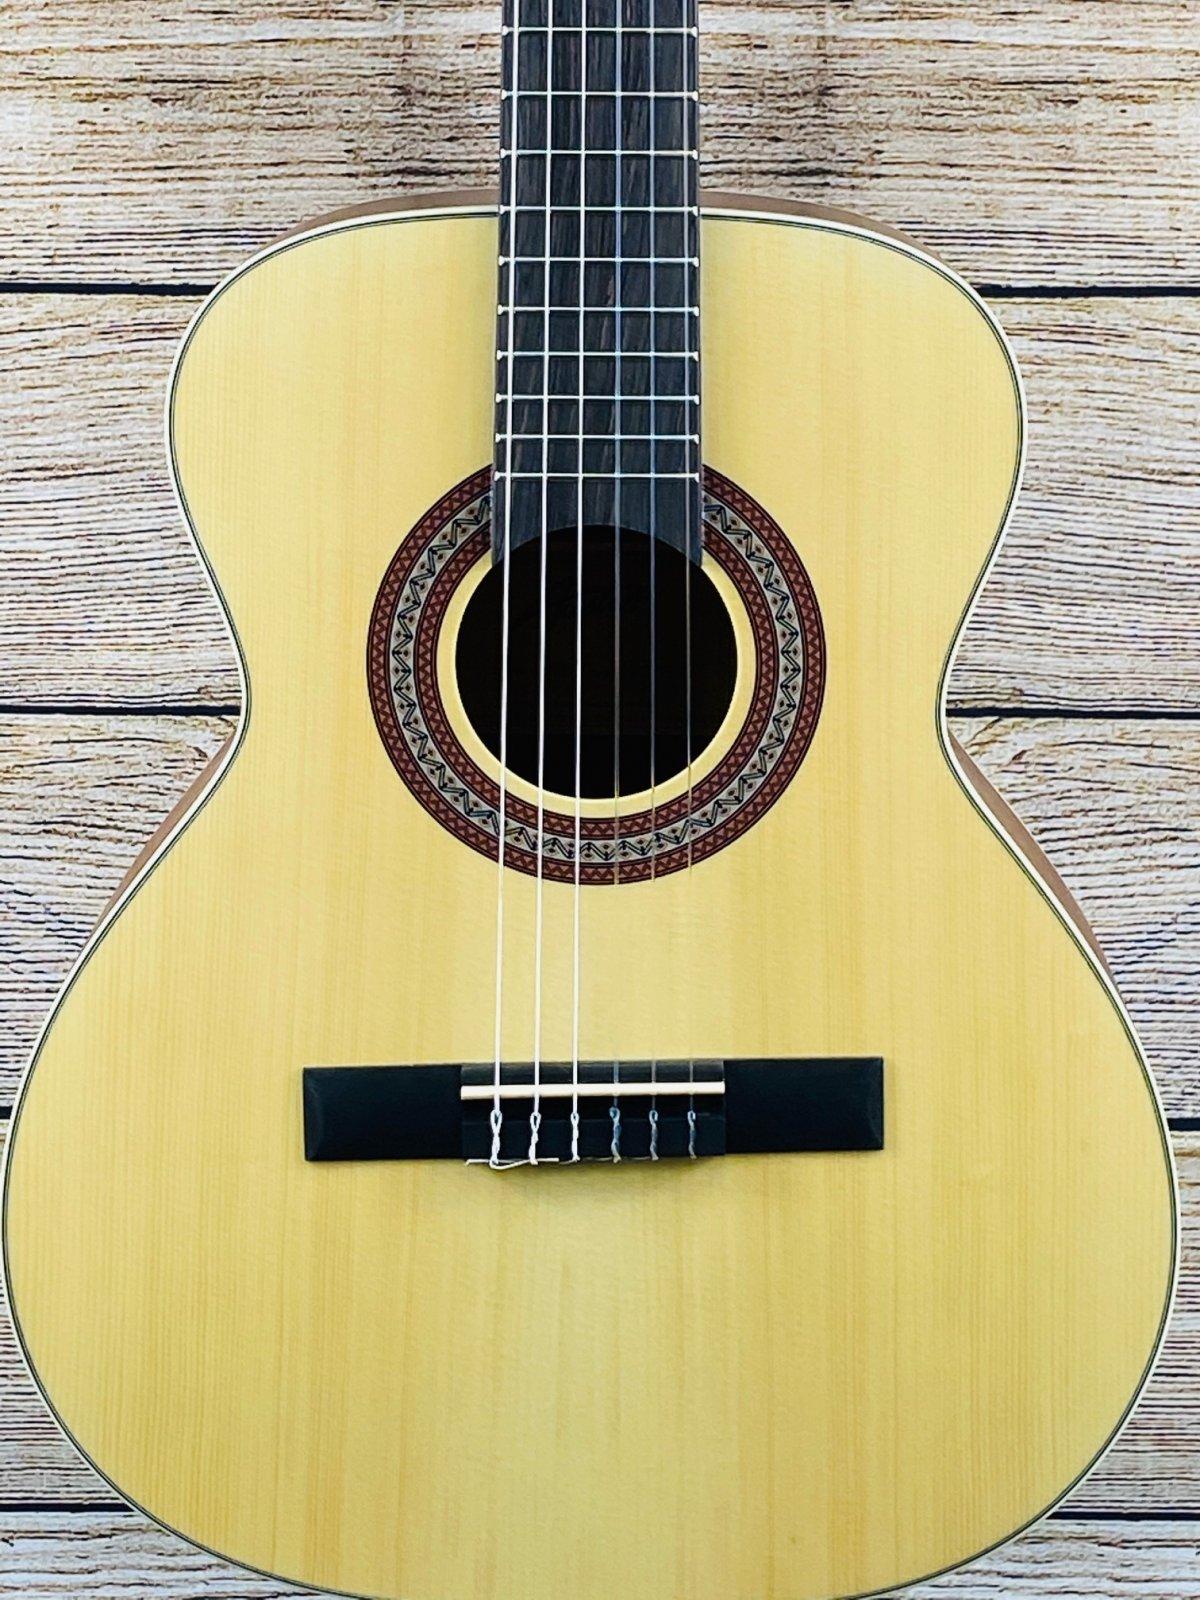 Austin AC334N 3/4 Size Classical Guitar